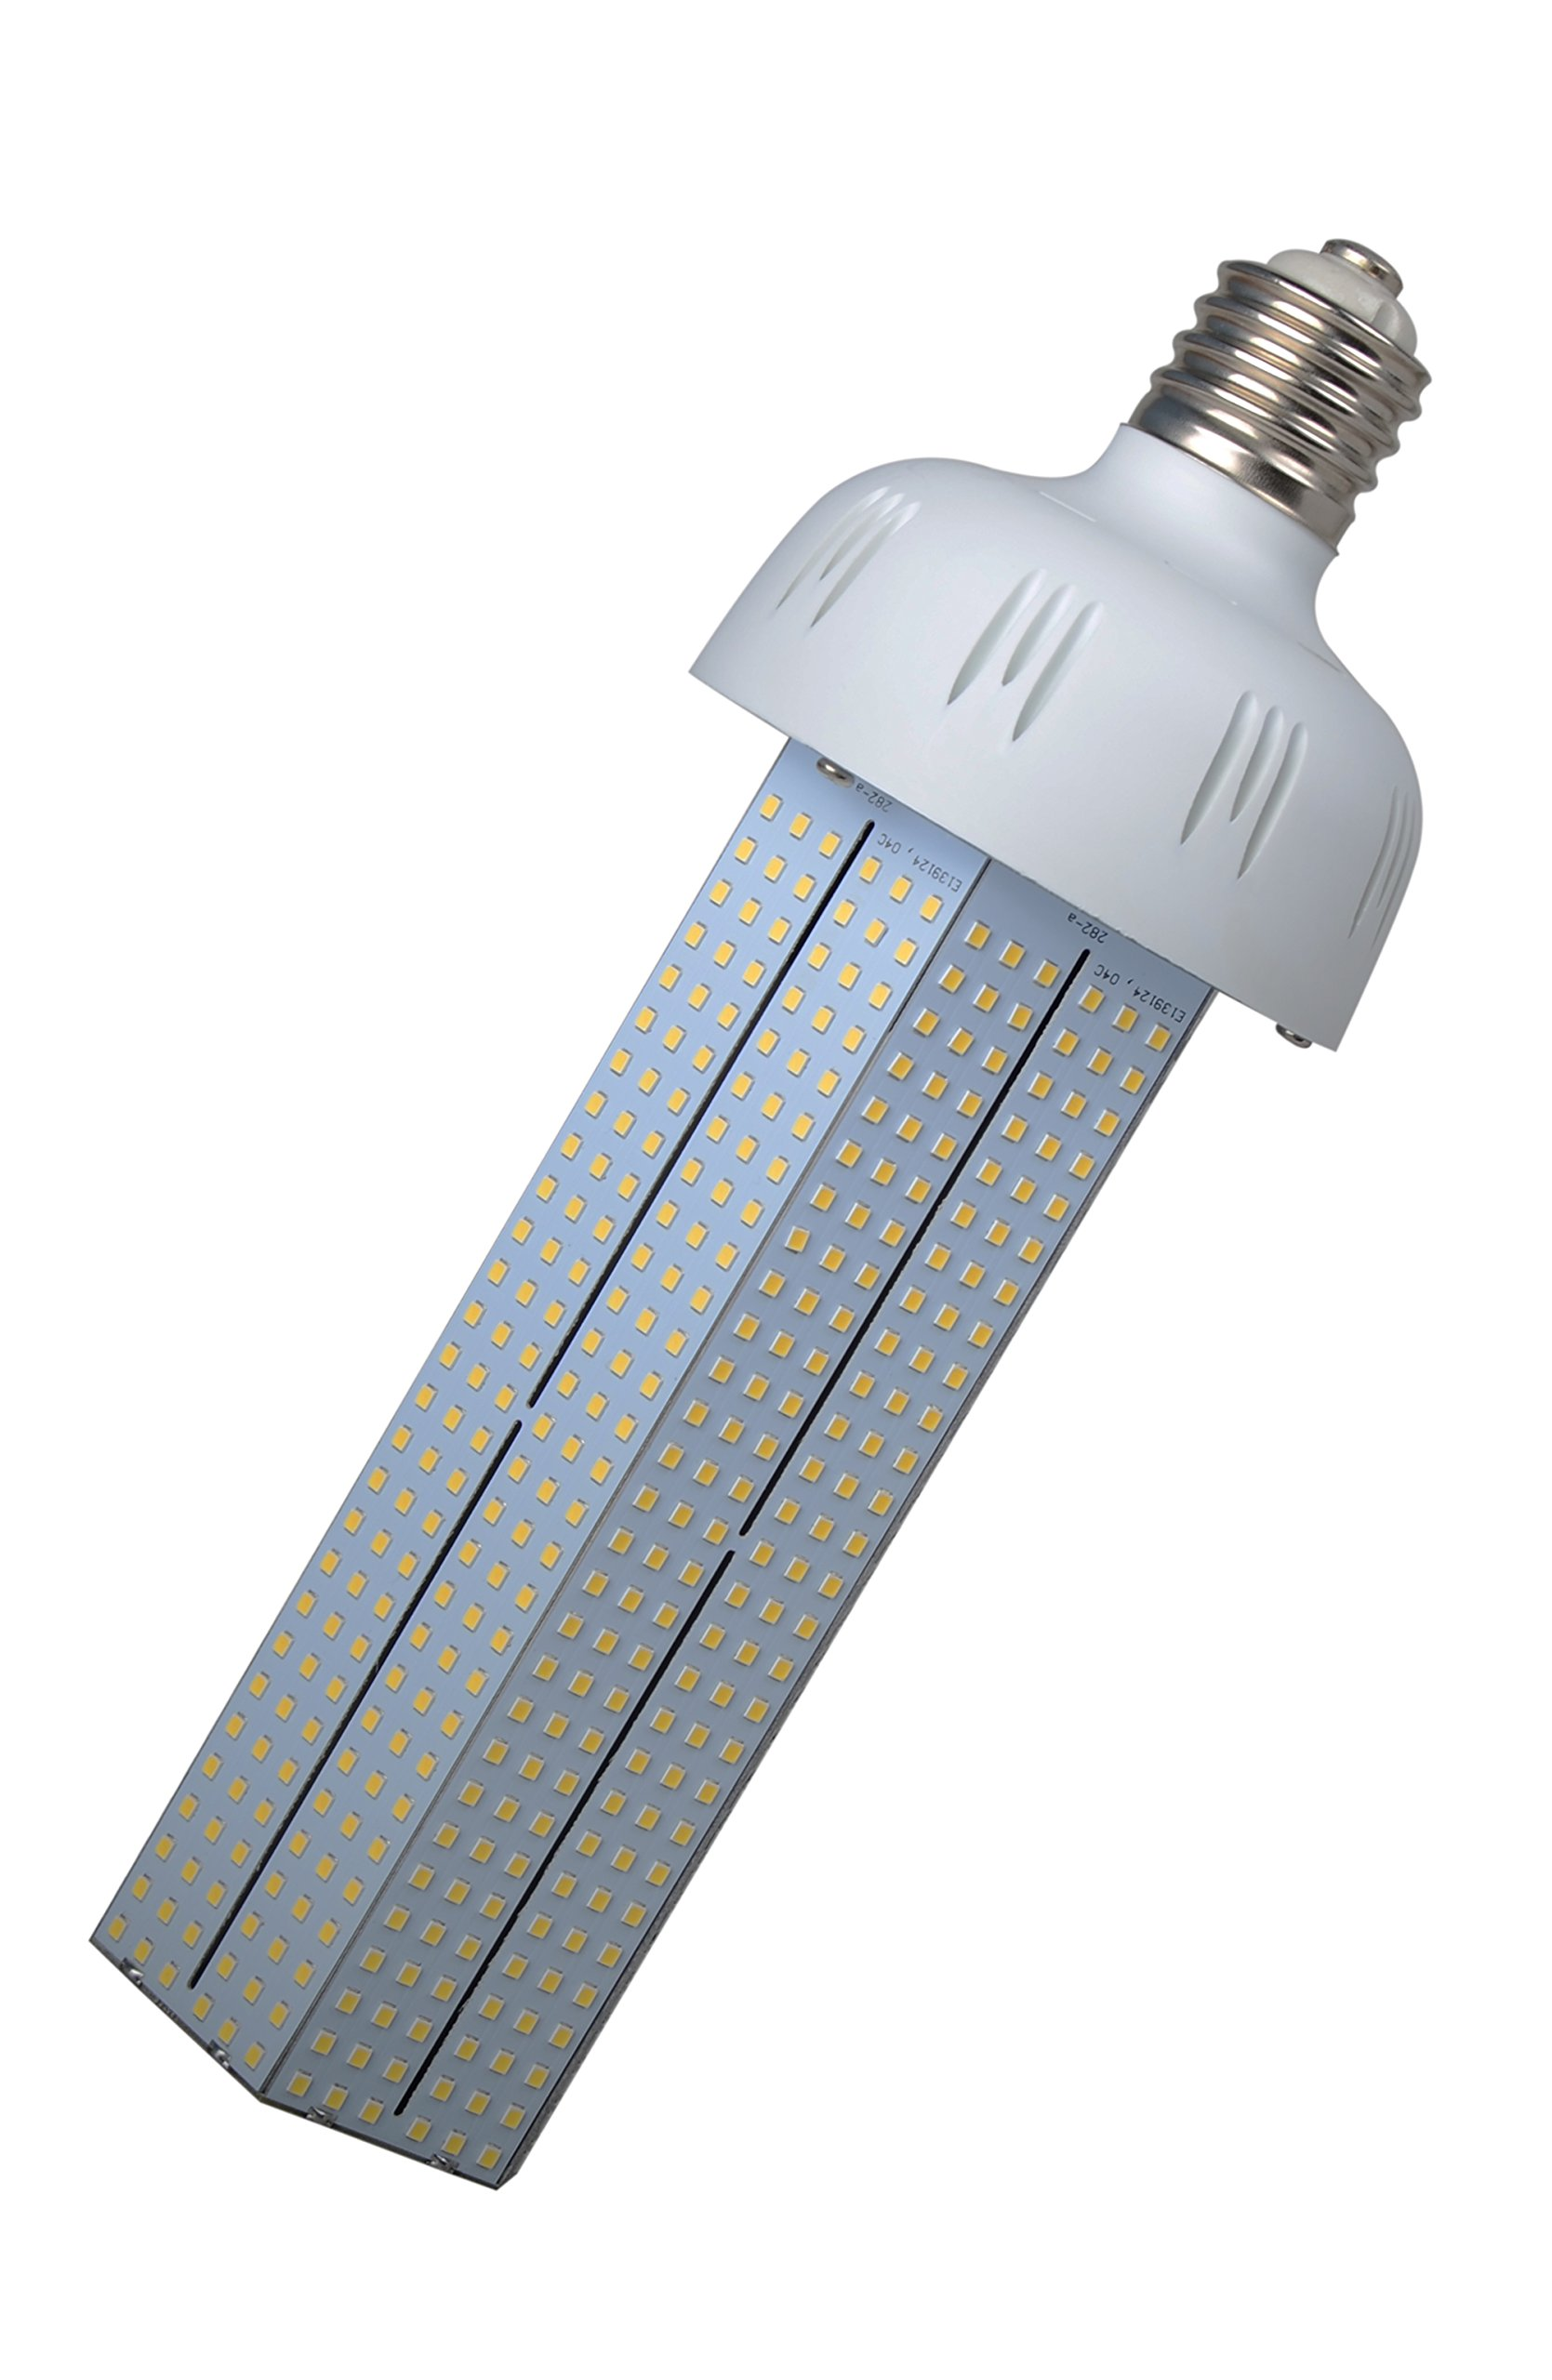 Pearlight LED Corn Bulb 120W E39 UL listed 5000k Ac277V Energy Saving High Power Light 15600 LM Lighting Angle 360 degree light to Replace HPS HID CFL Bulb